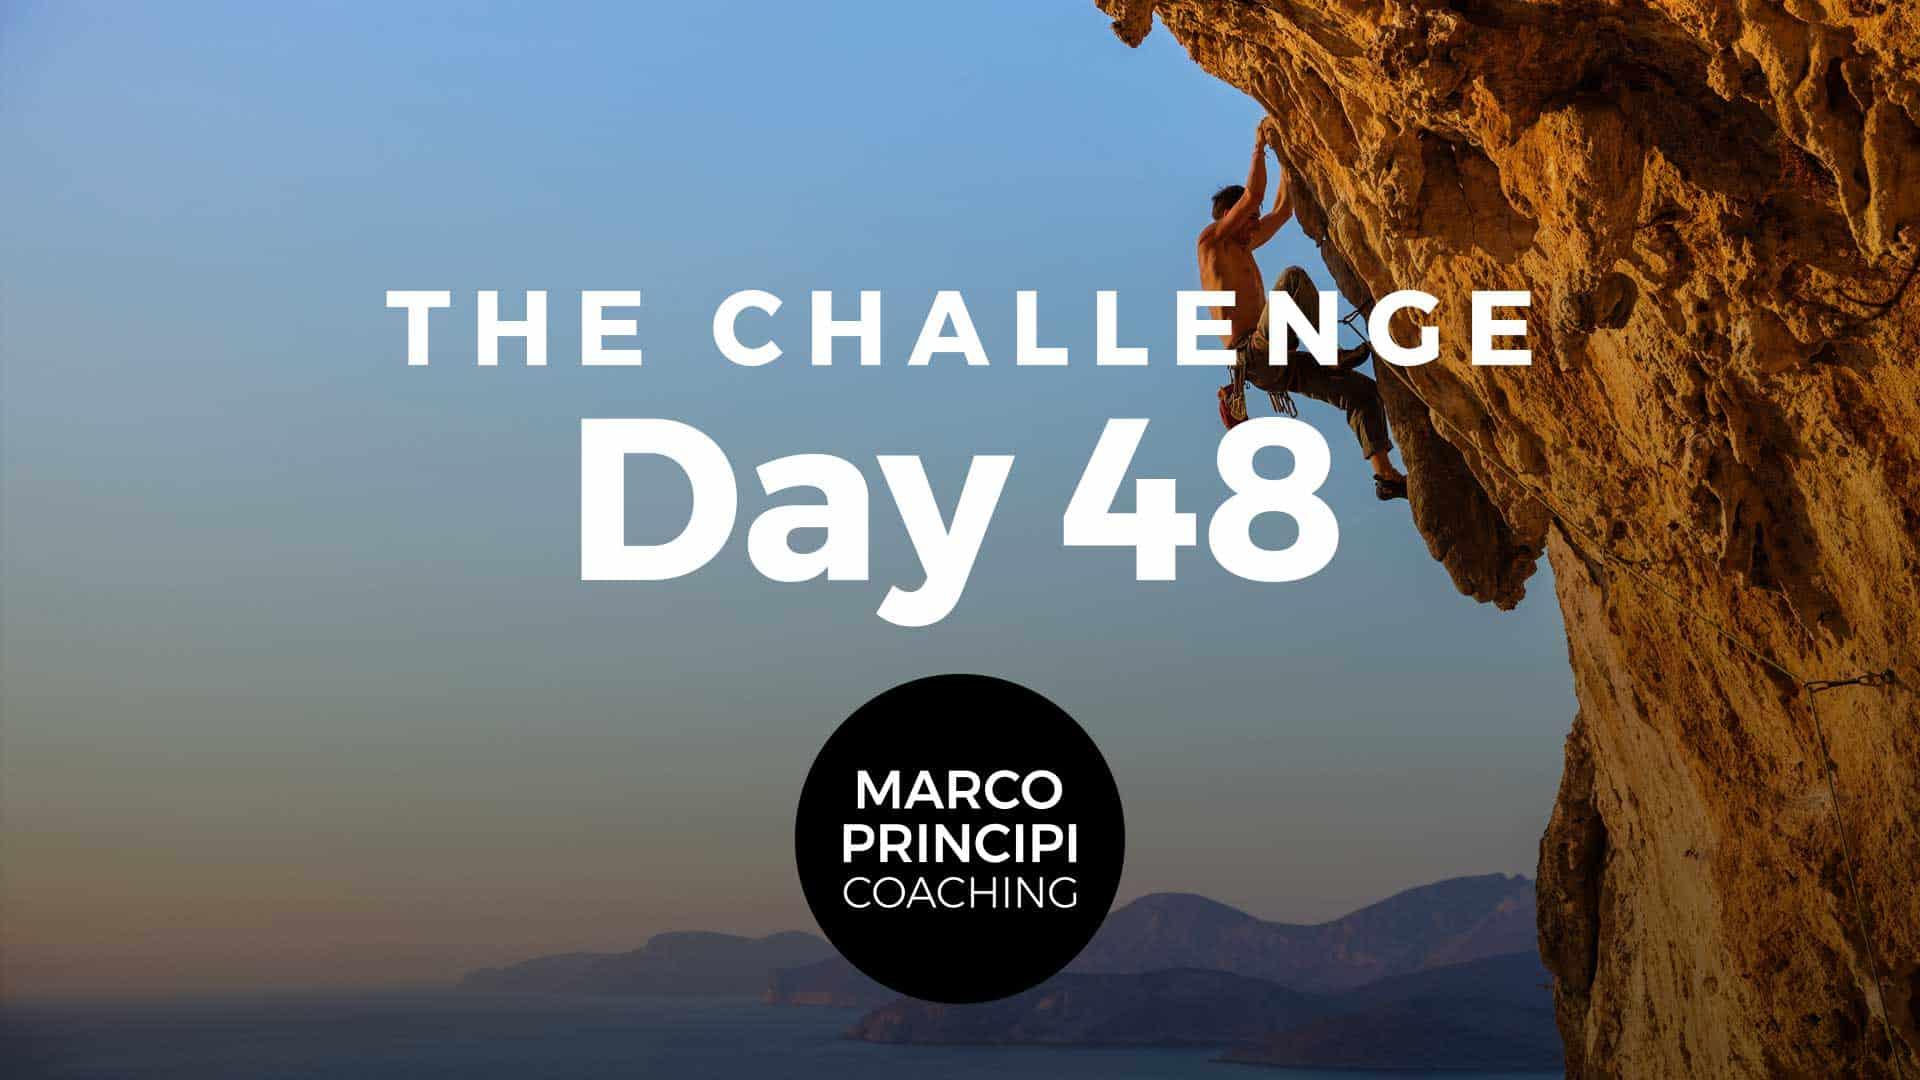 Marco Principi The Challenge Day 48